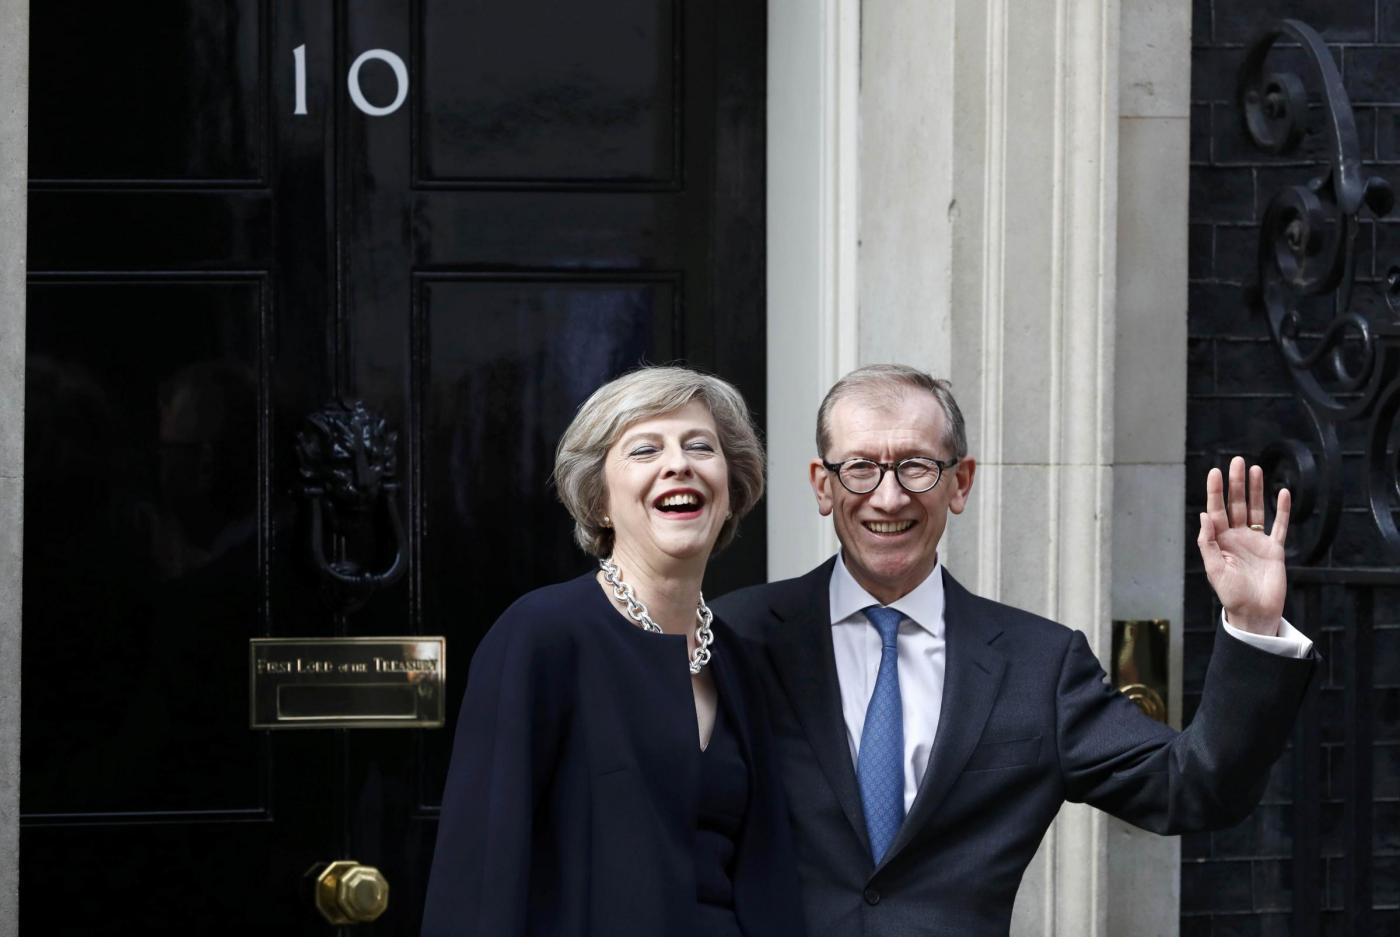 Londra, la regina Elisabetta nomina Theresa May nuovo Premier